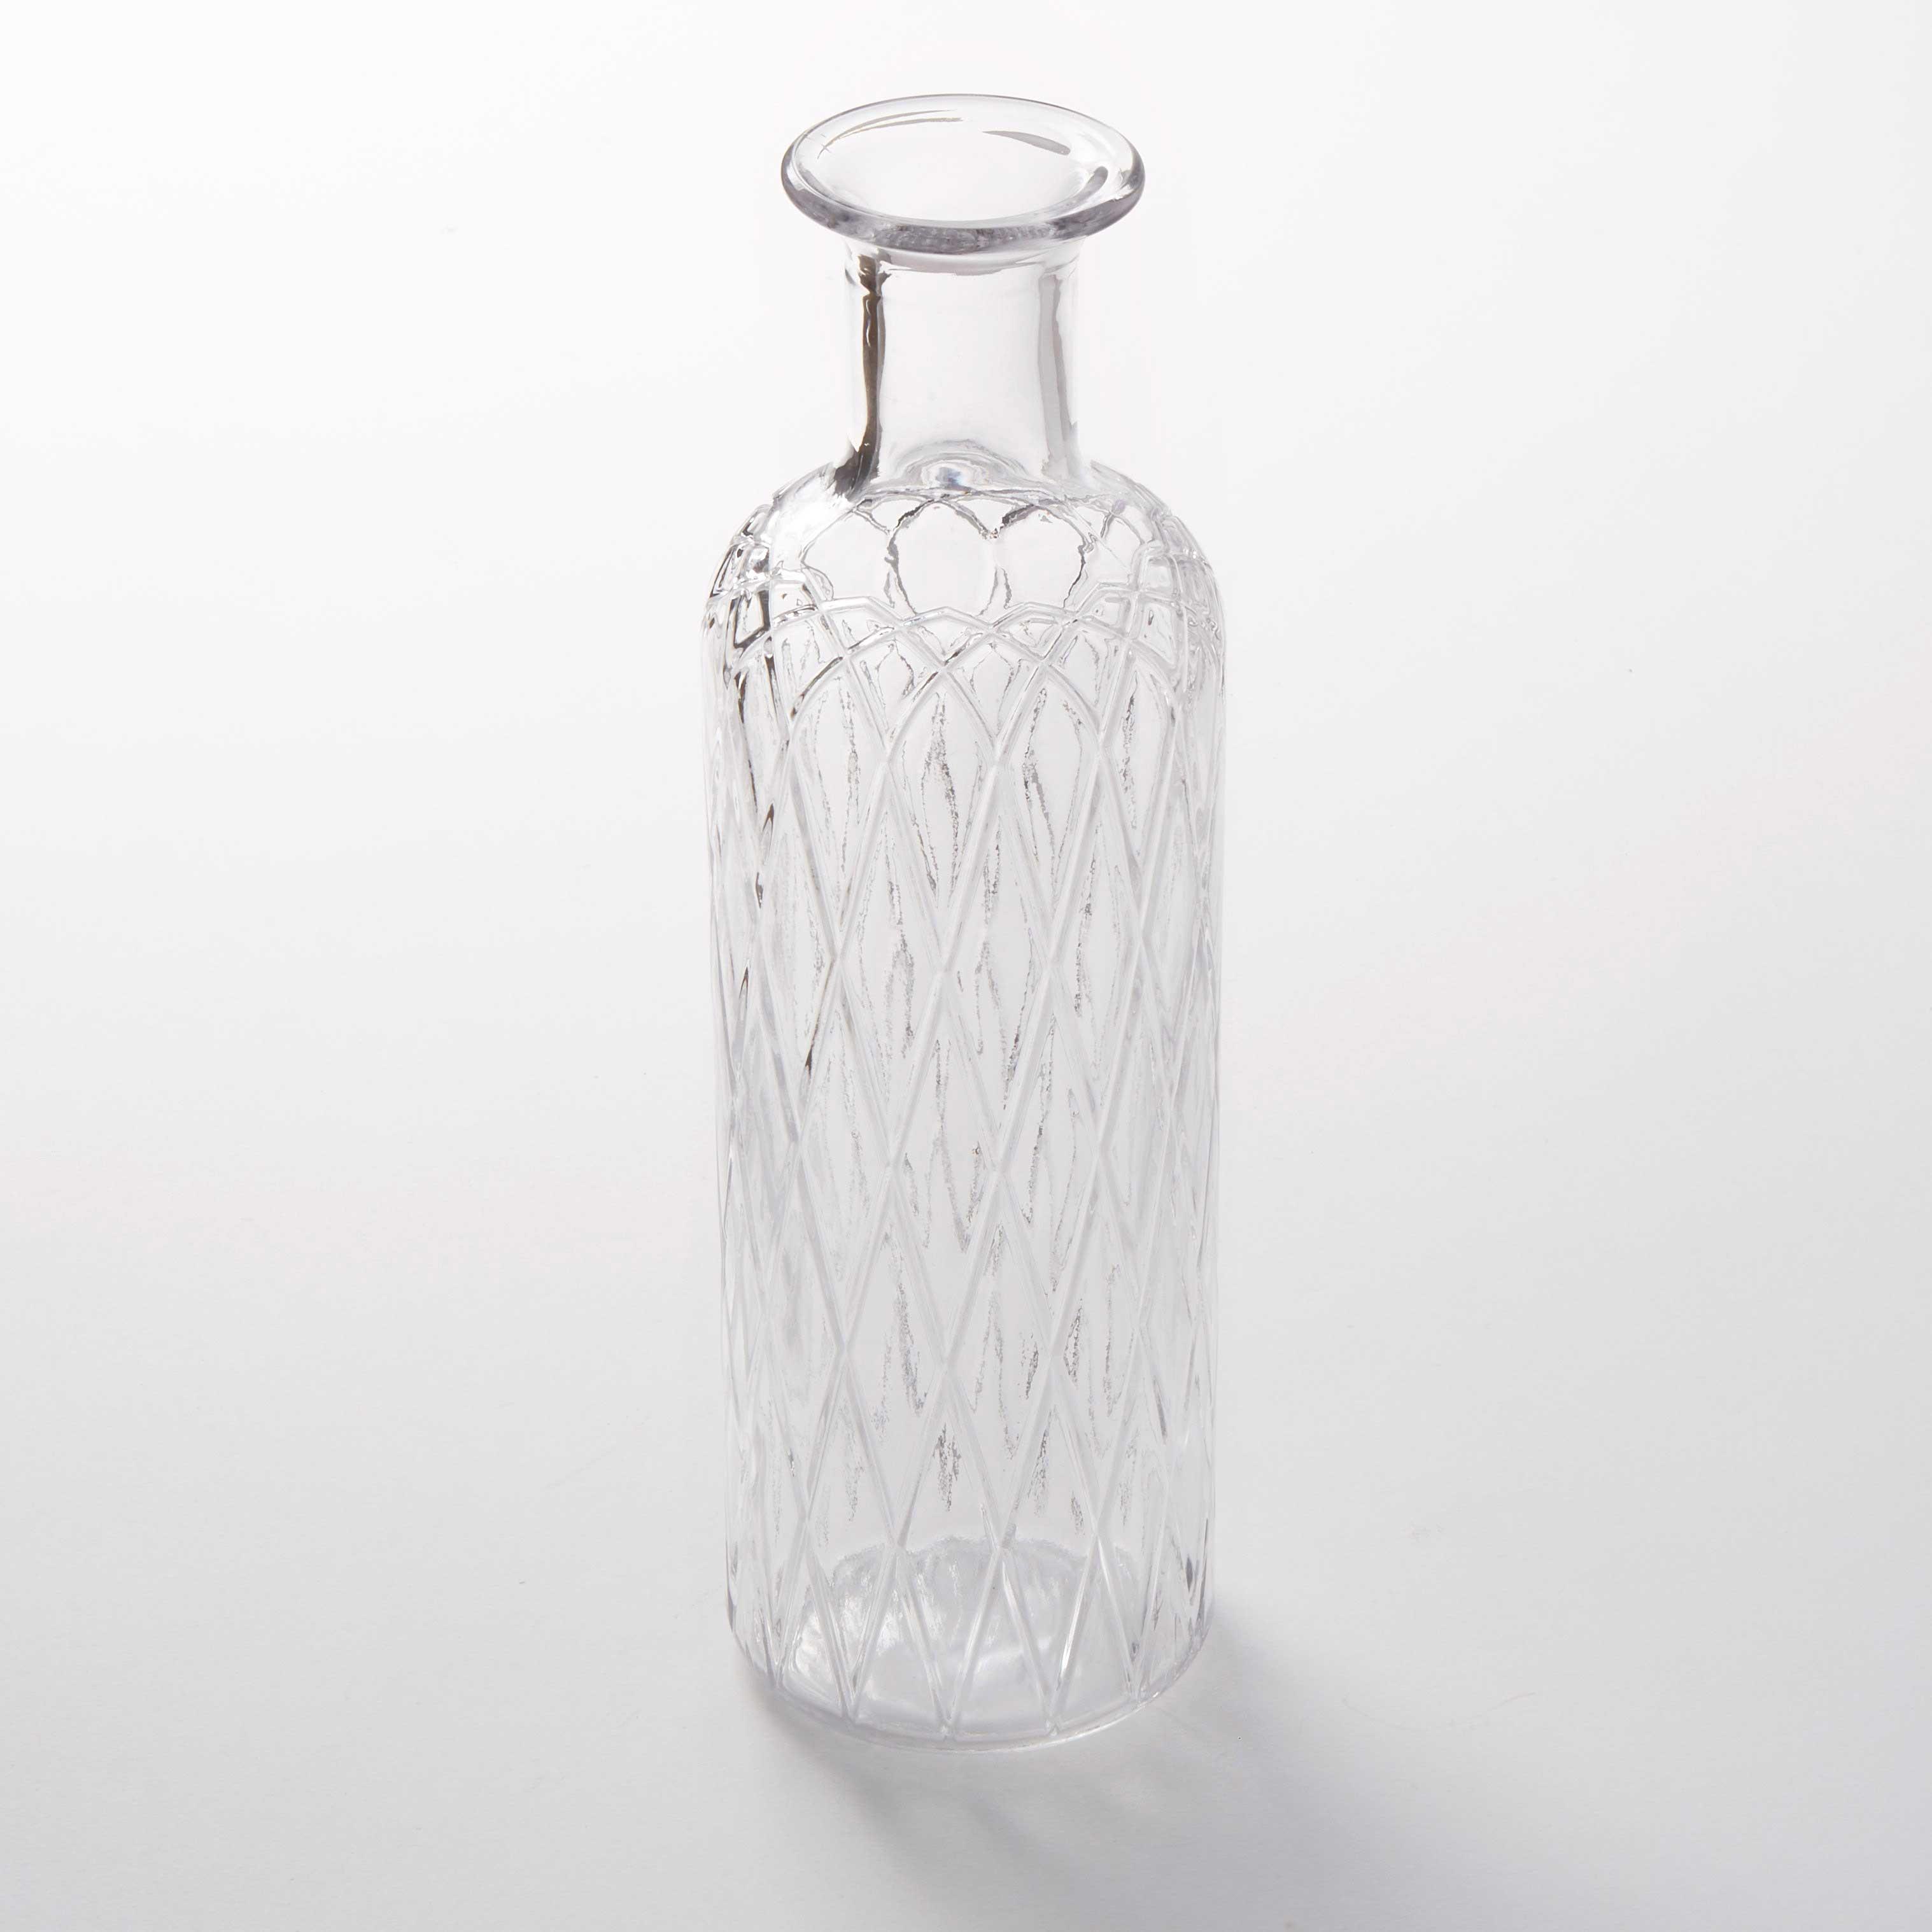 American Metalcraft GCD28 glass, bottle